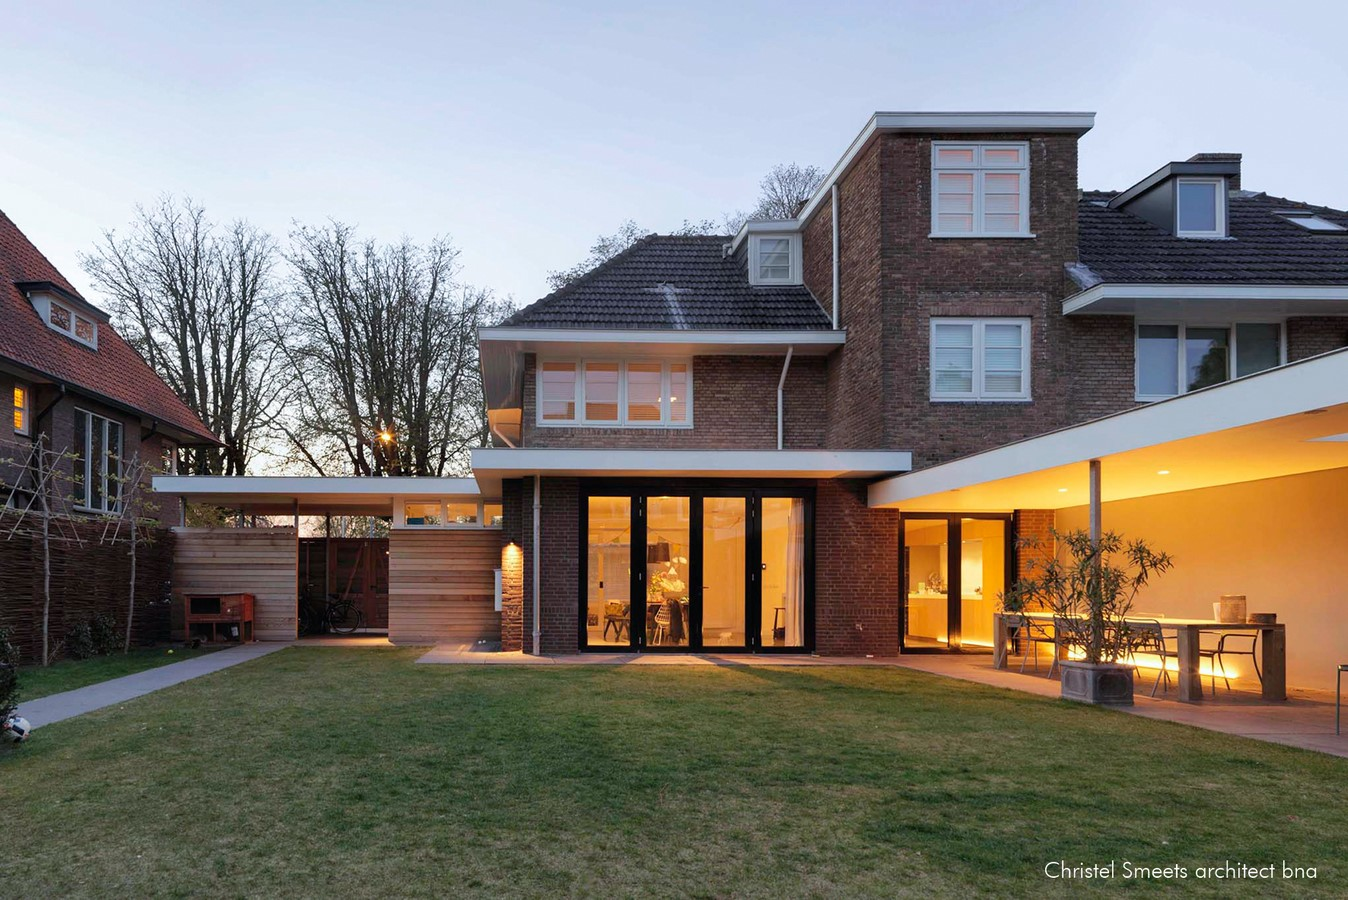 Architects in Breda - Top 55 Architects in Breda - Sheet11